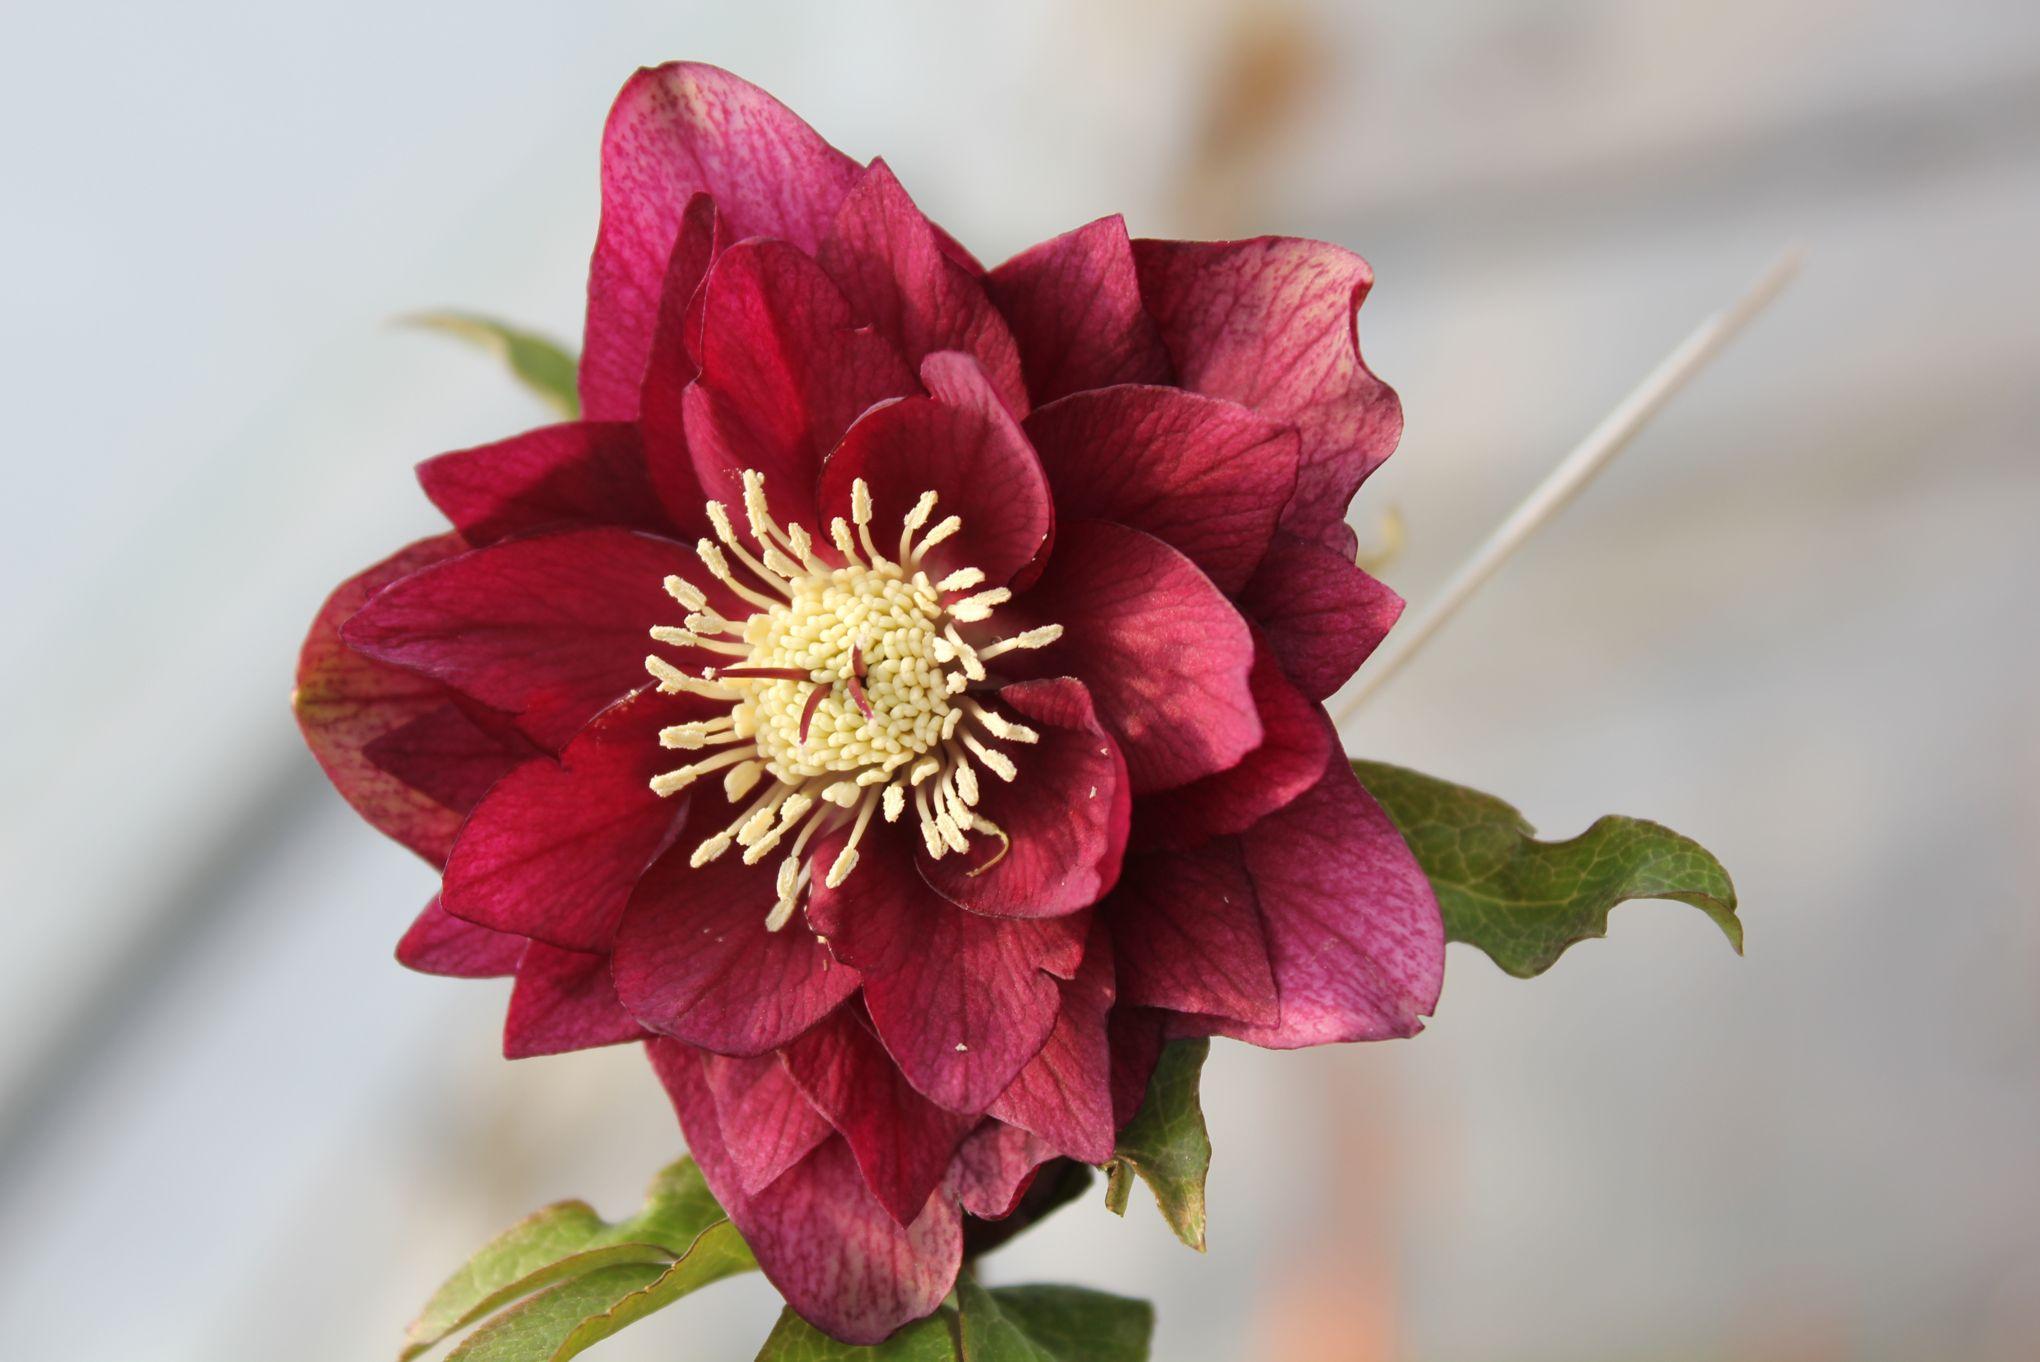 hell bore la sublime rose de no l qui enchante l 39 hiver. Black Bedroom Furniture Sets. Home Design Ideas